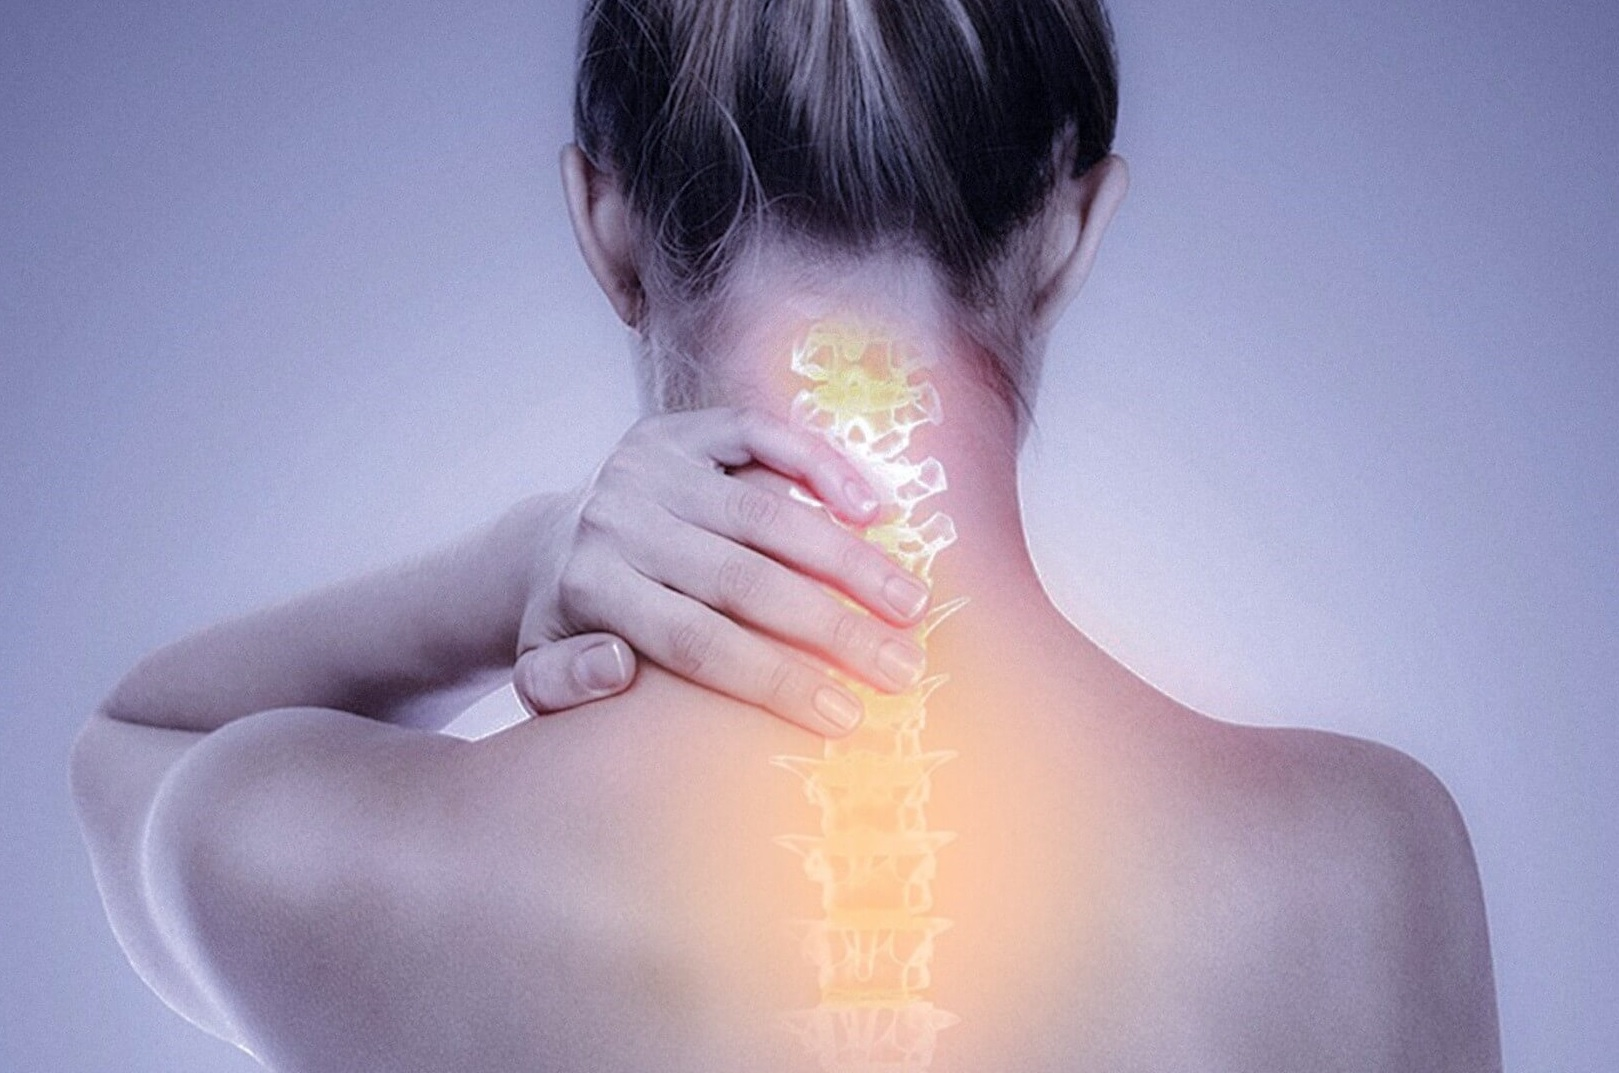 Scintilla, Terapie naturali, dolori fisici, infiammazione, mal di schiena, cervicali, cervicalgia